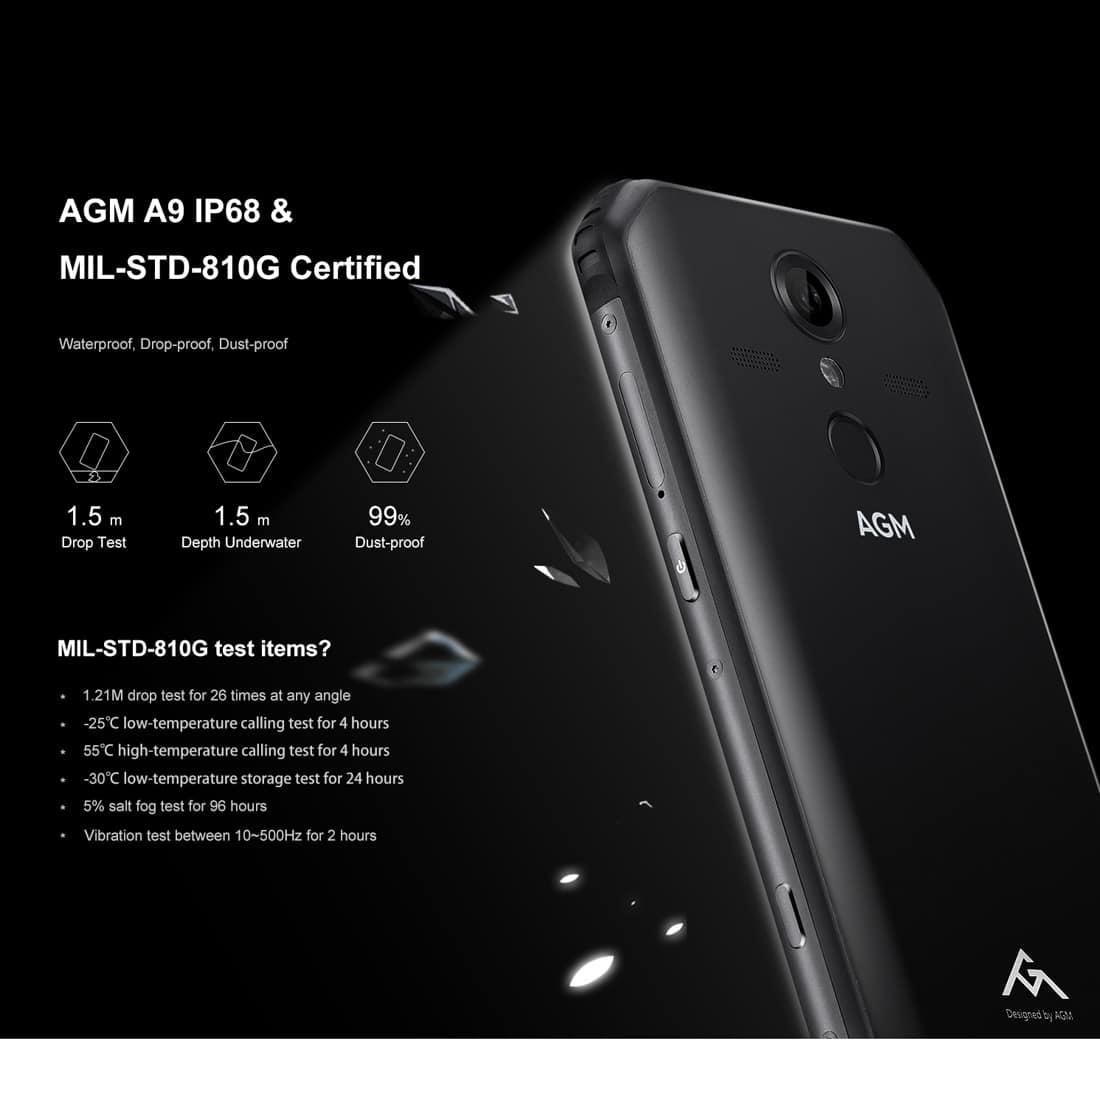 AGM A9 Rugged Smartphone